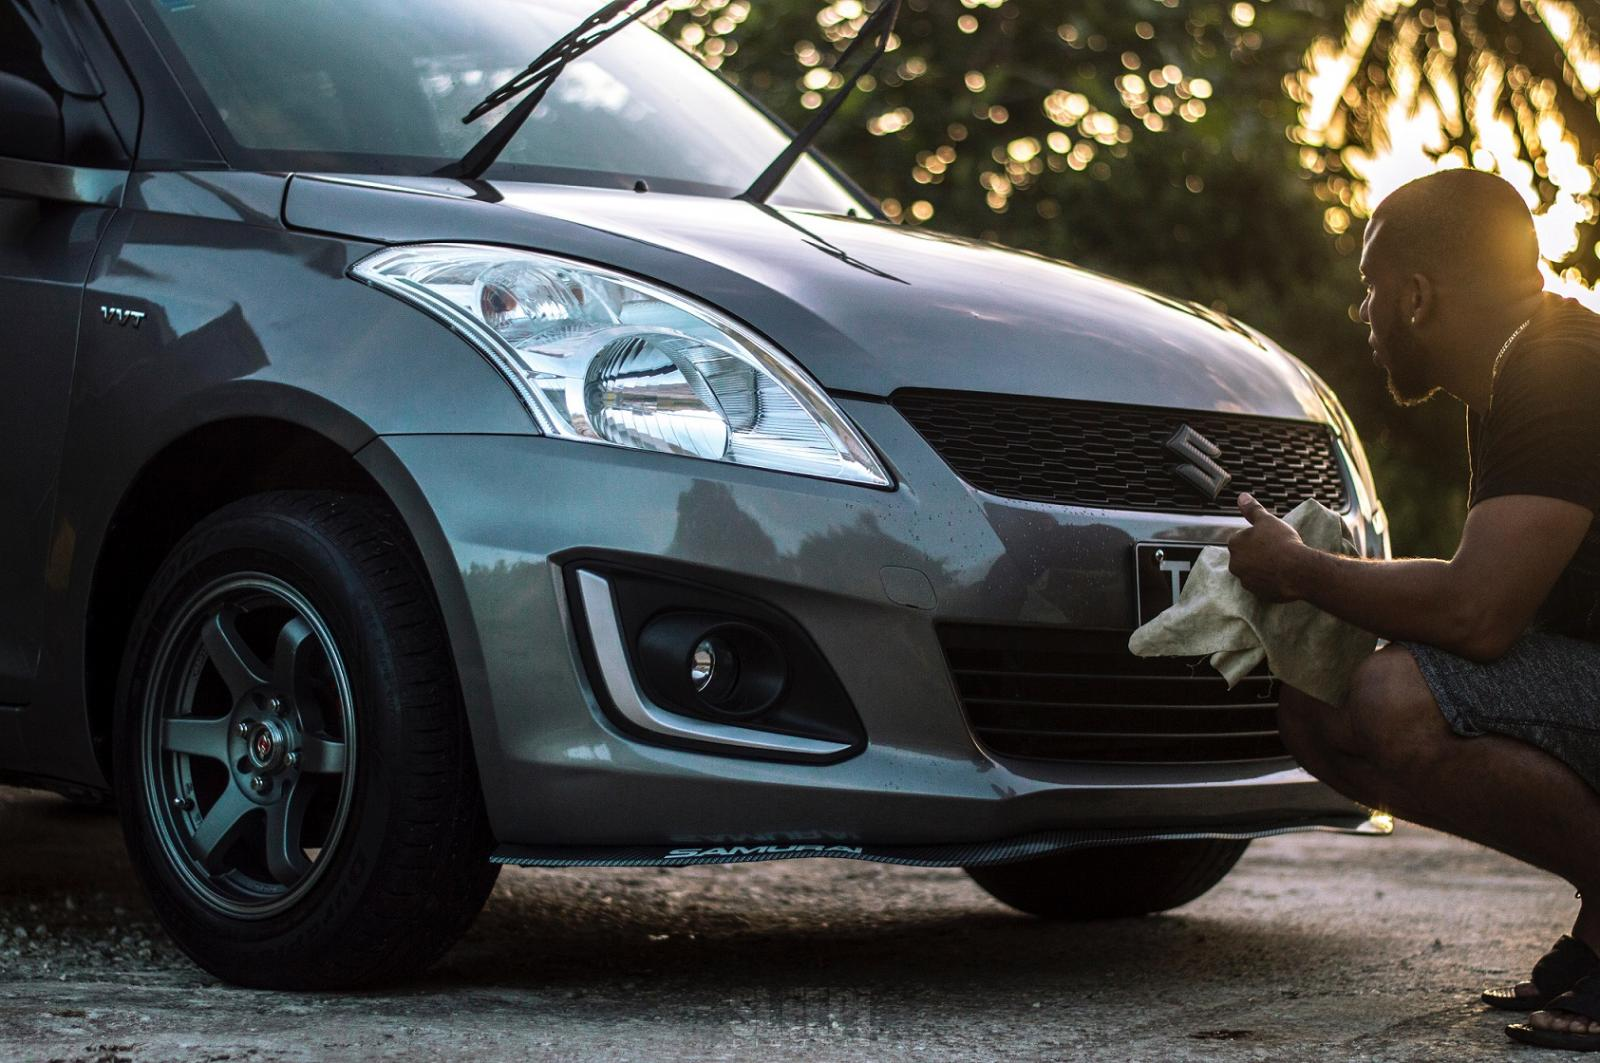 5 tareas fáciles para mantener siempre tu auto limpio